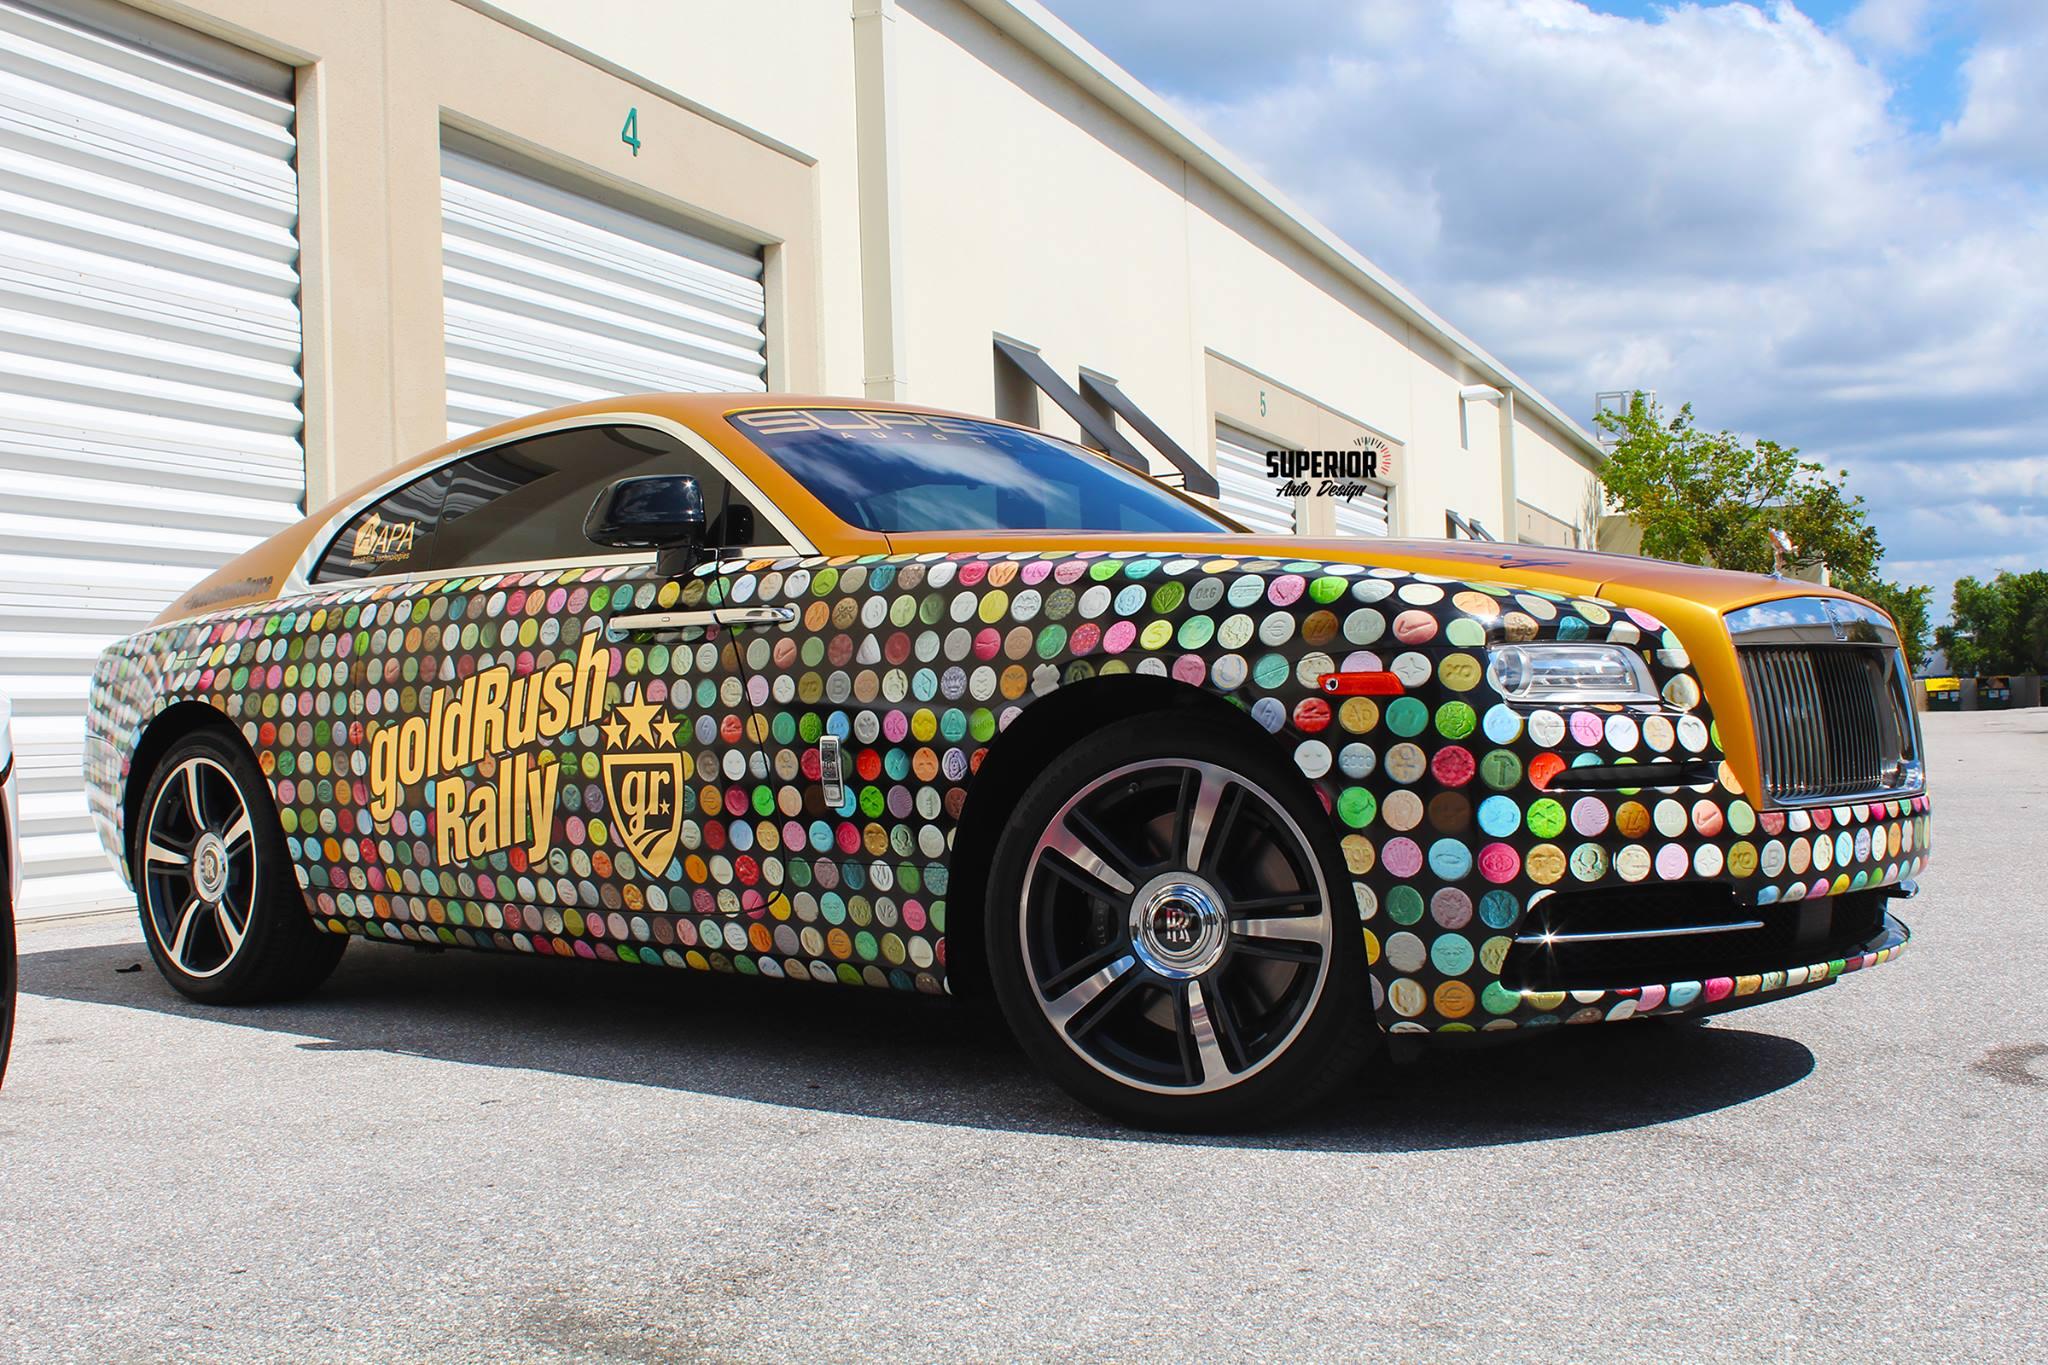 rolls-royce-goldrush-rally-superior-auto-design-4